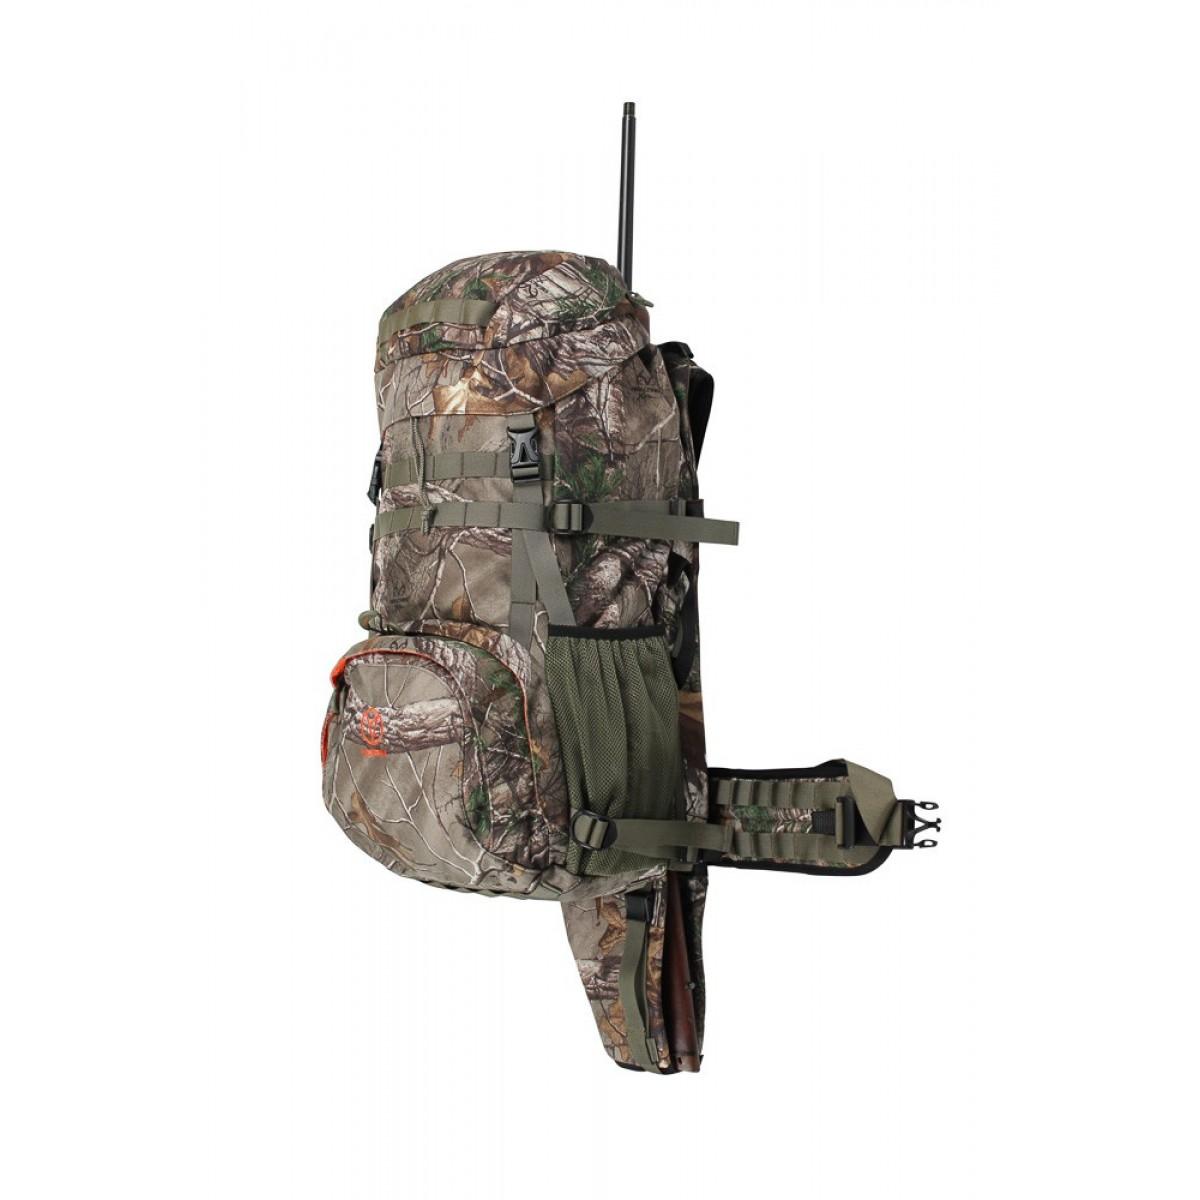 Vorn Deer 42 L Realtree Xtra Camo Väskor Jakt